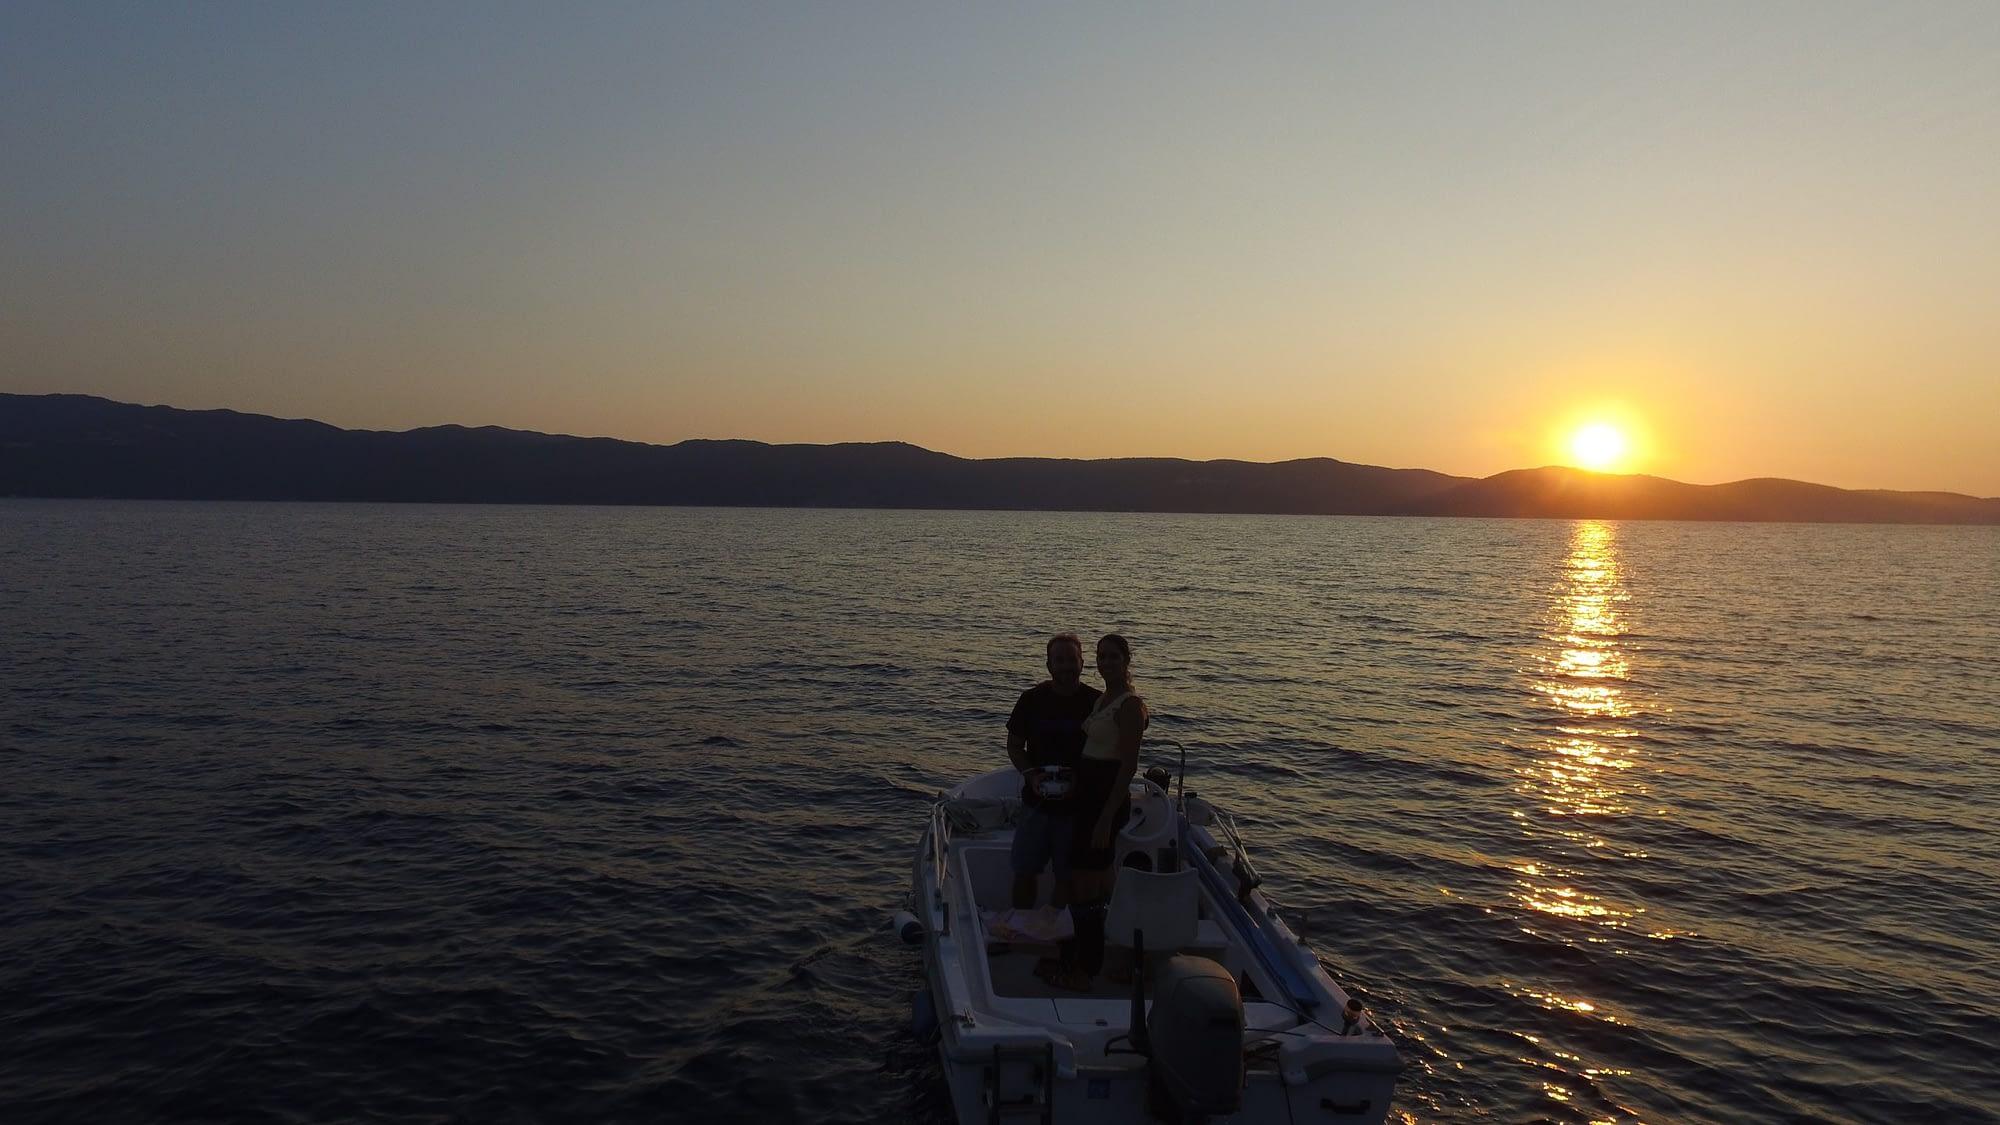 Sunset views Ithaca Greece, Stavros